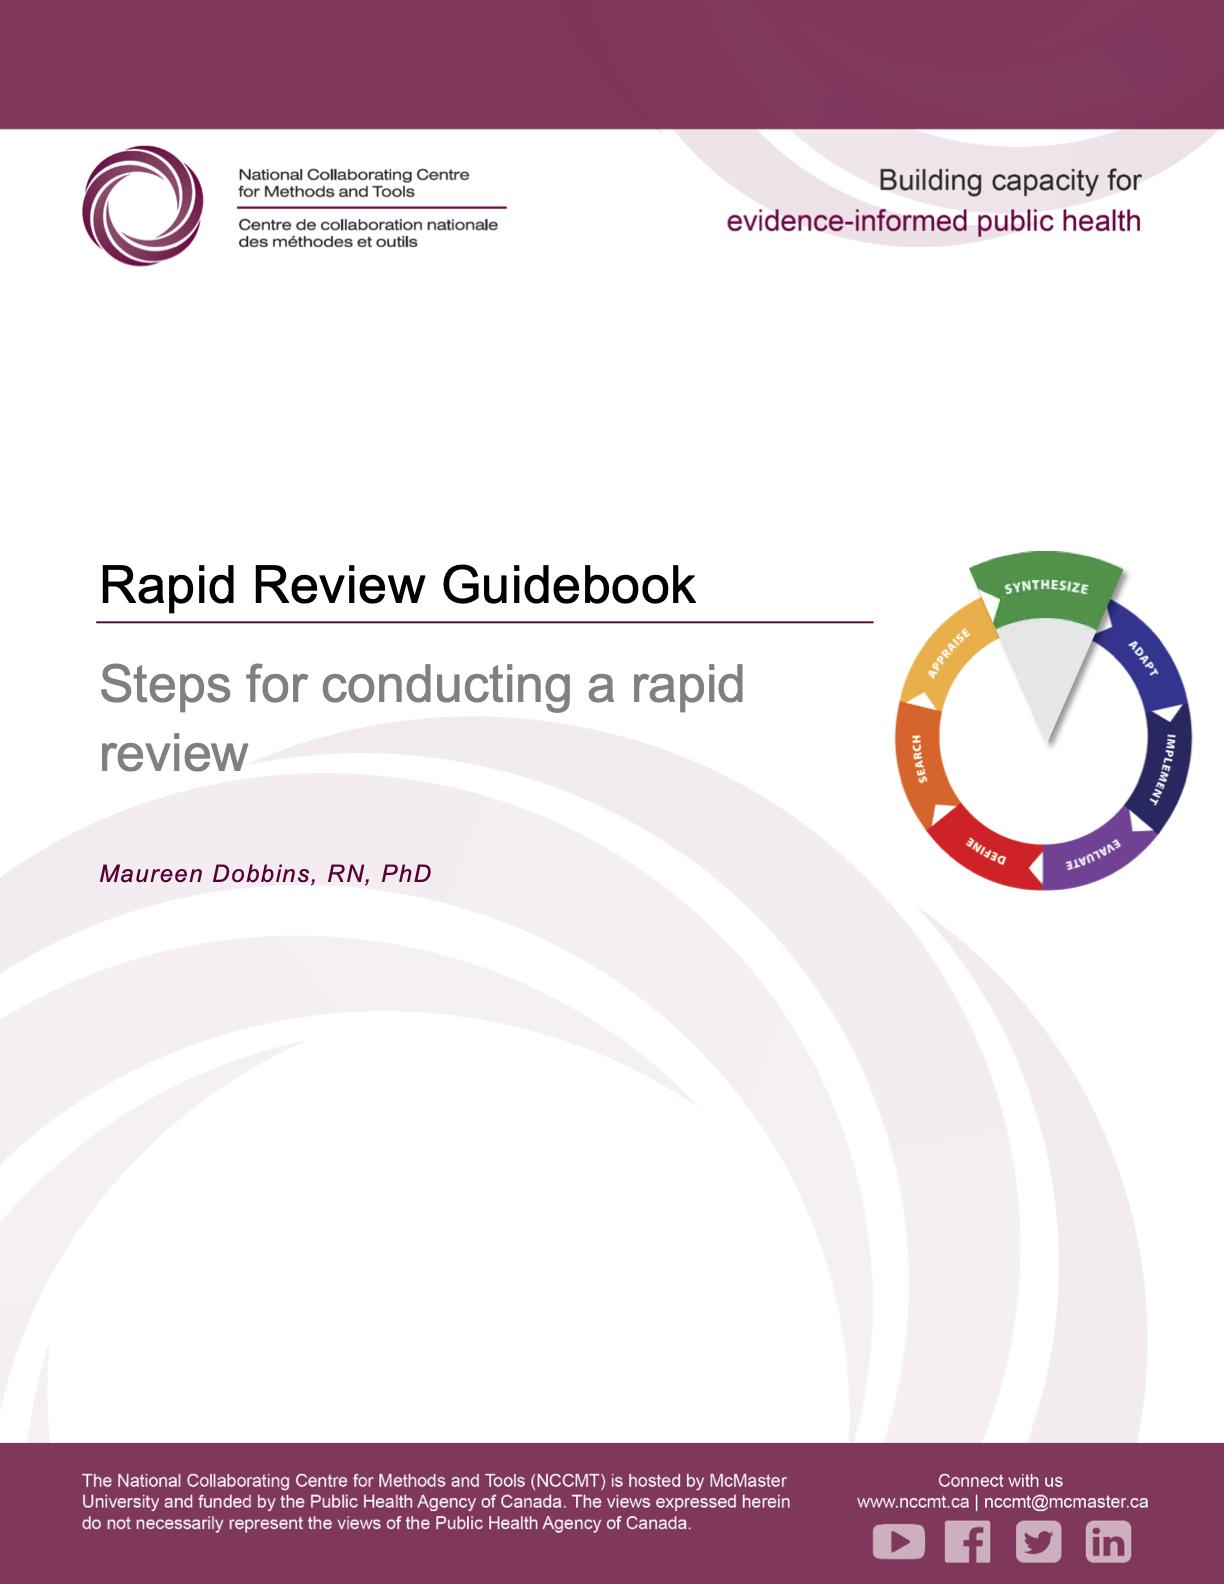 NCCMT Rapid Review Guidebook